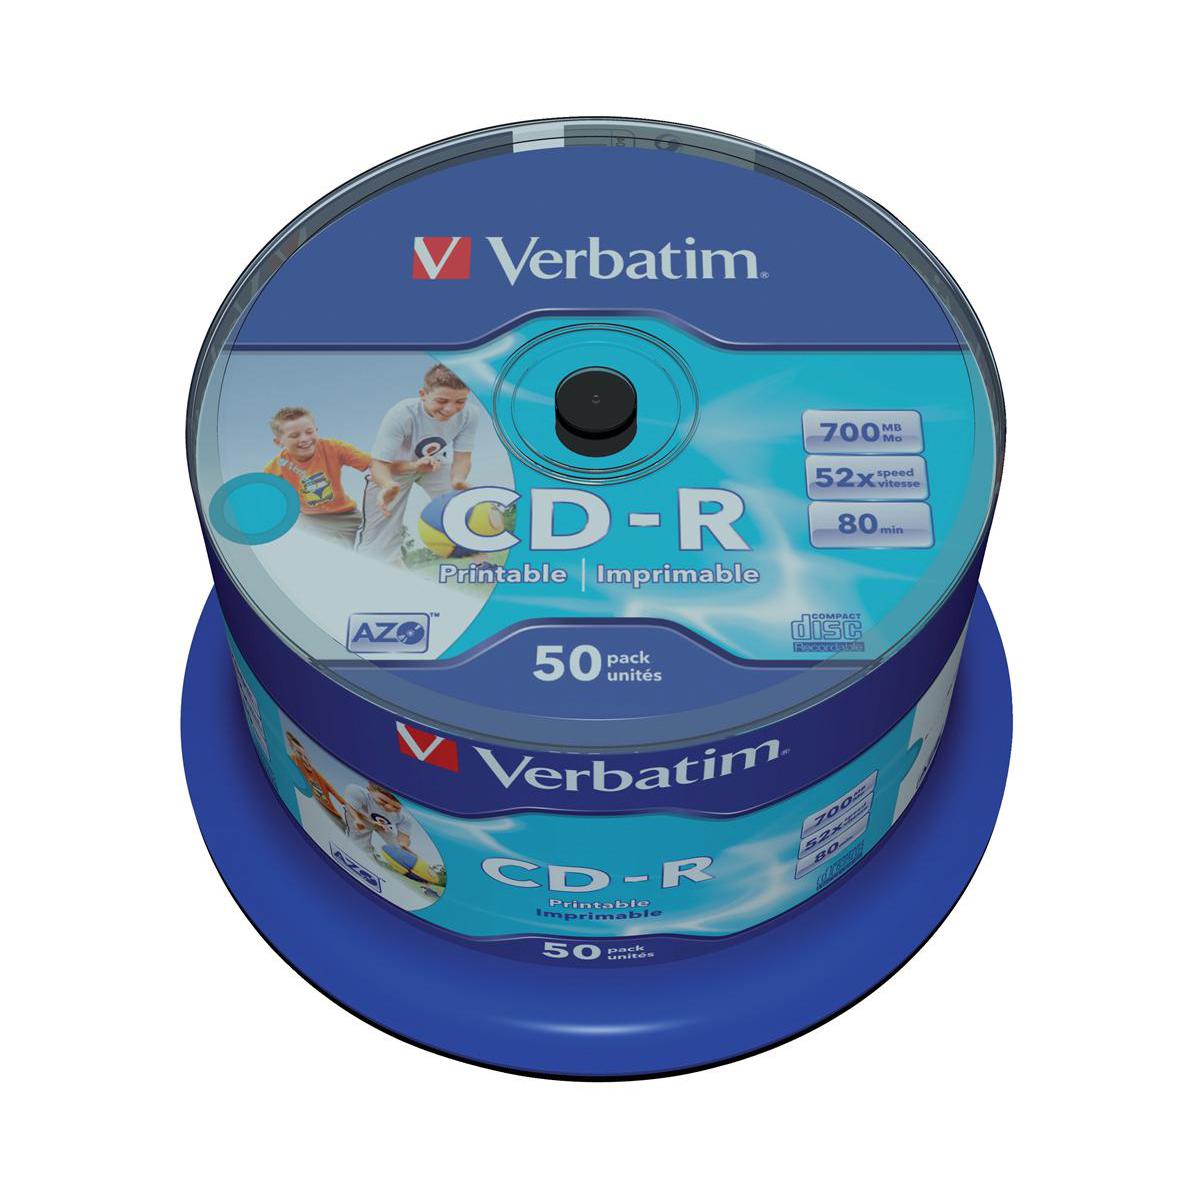 Verbatim CD-R Recordable Disk Inkjet Printable on Spindle 52x Speed 80min 700Mb Ref 43438 [Pack 50]